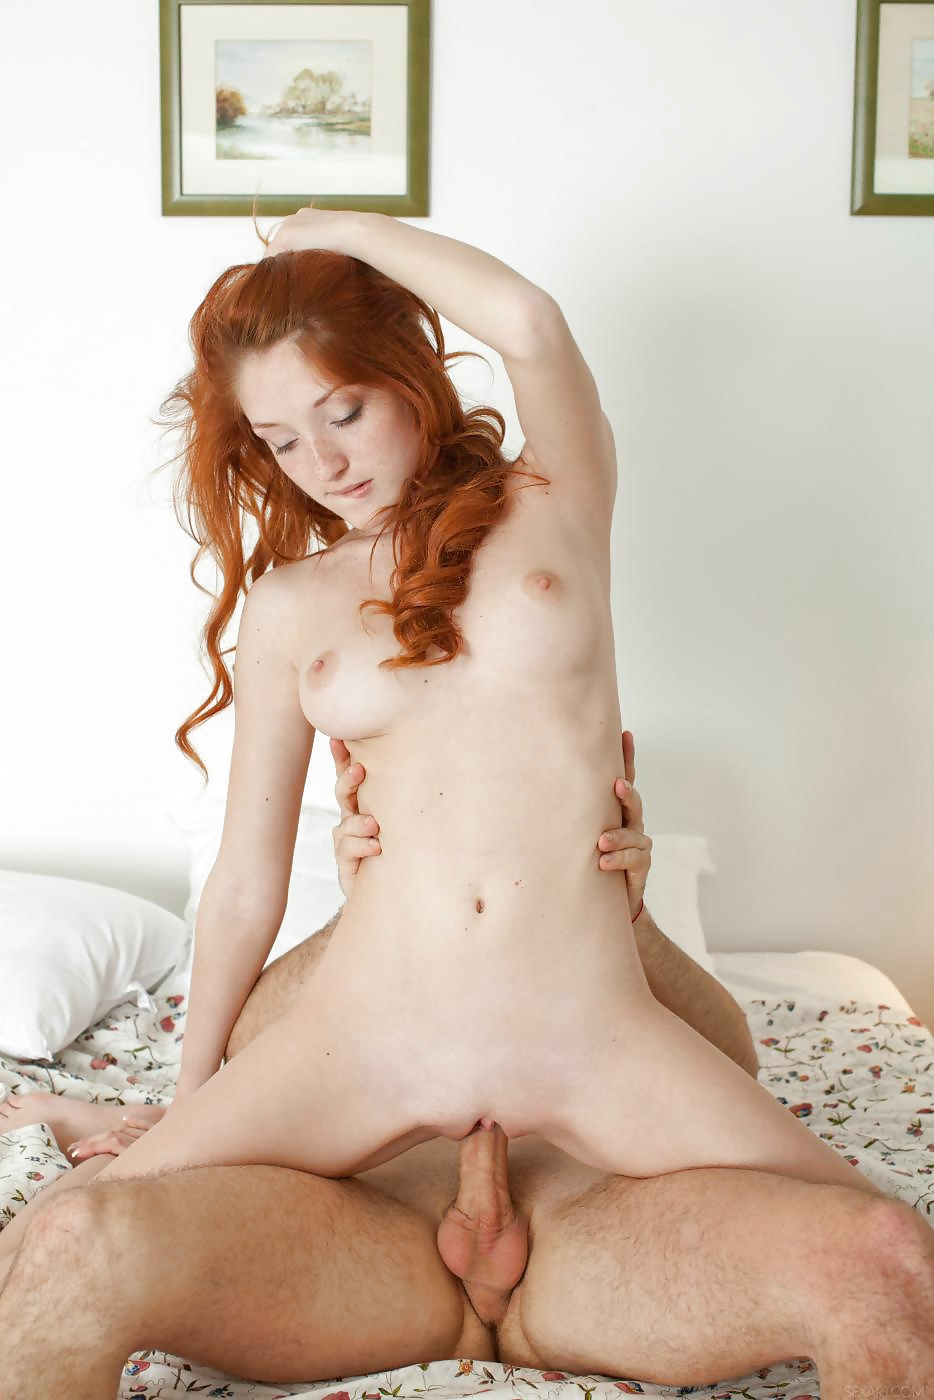 Naked redhead petite exposed uk